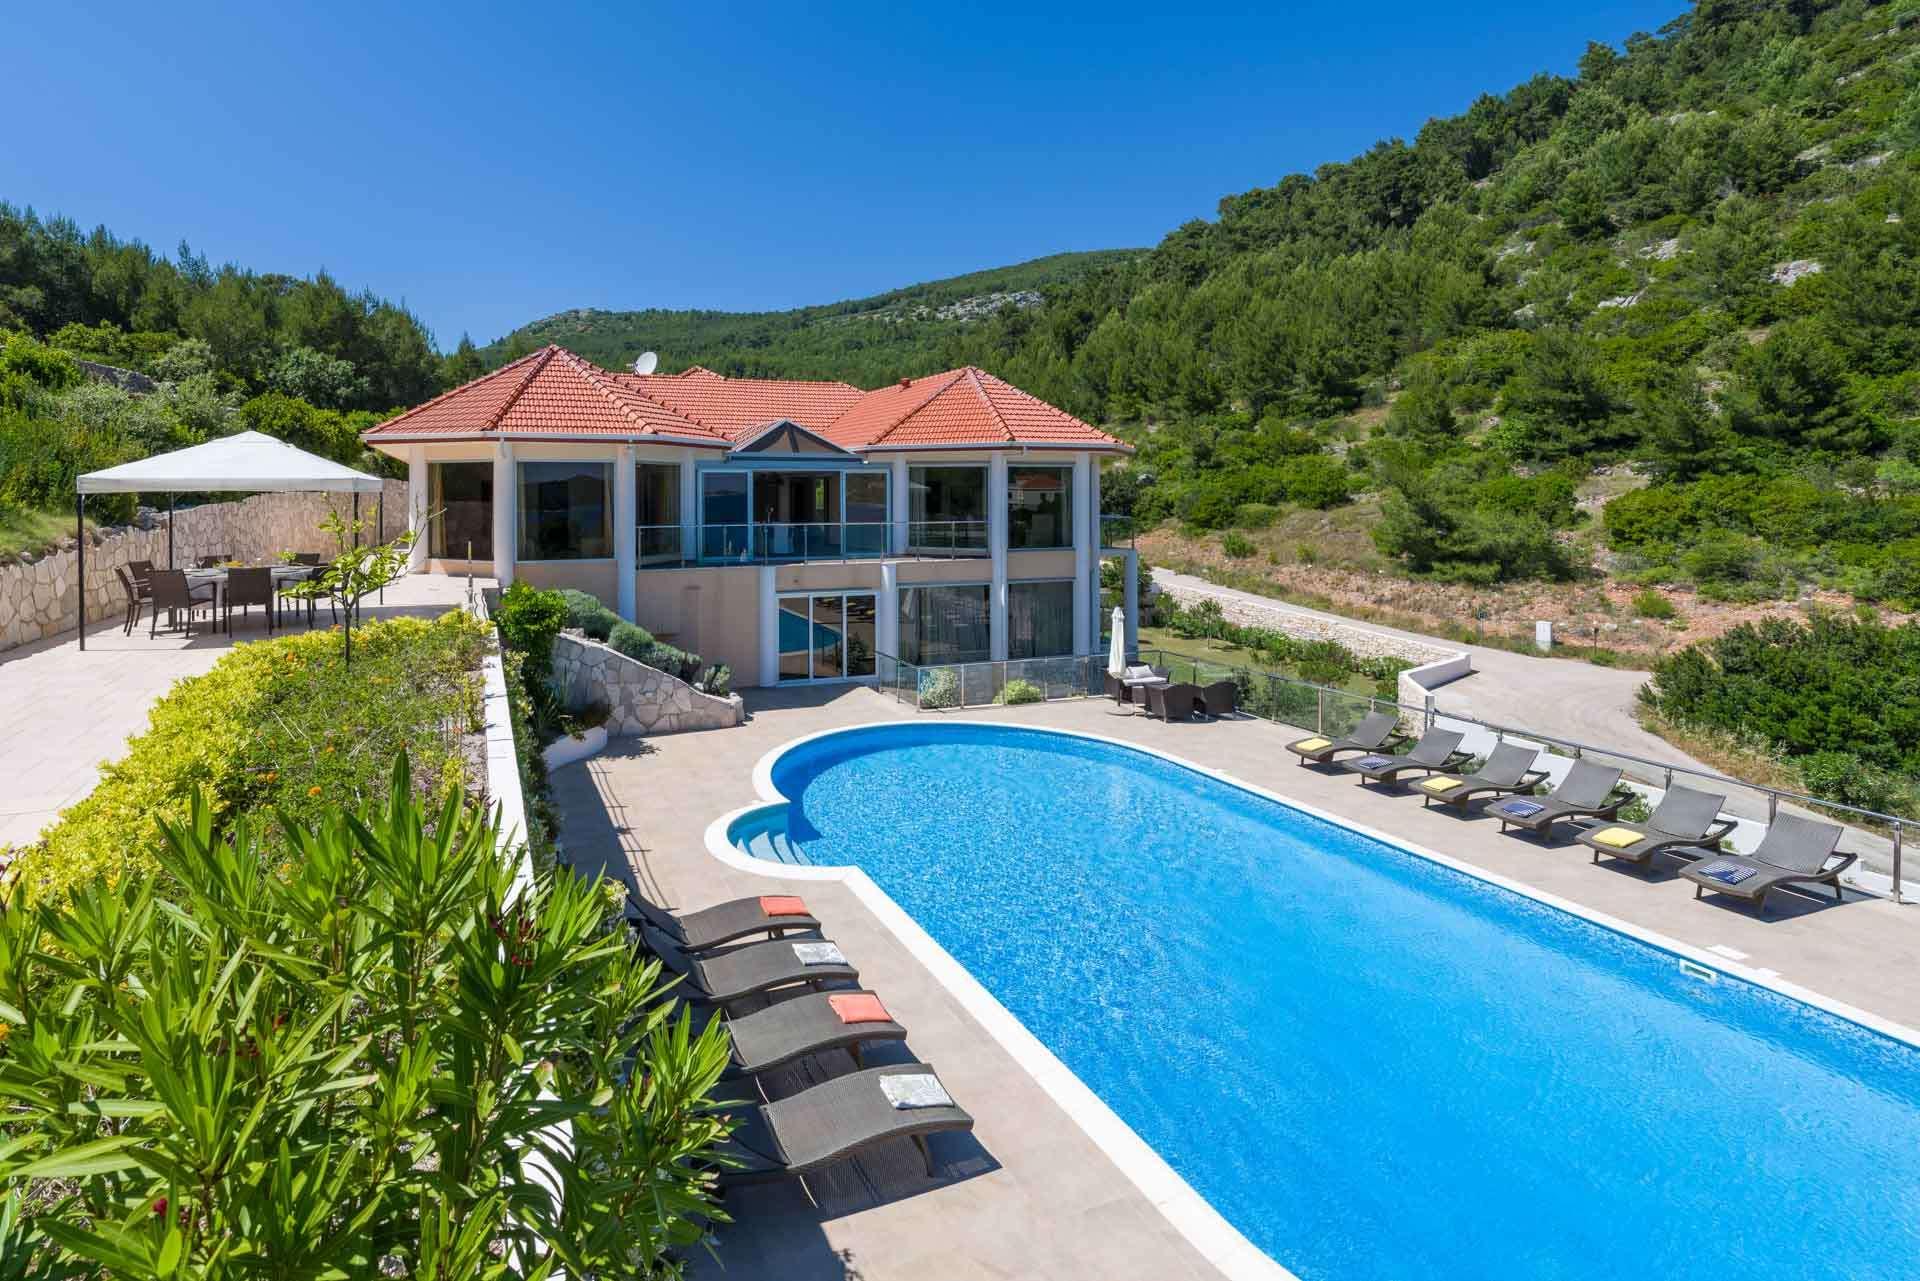 Luxury vacation rentals europe - Croatia - Korcula island - Karbuni - Essenza Zaglav - Image 1/64